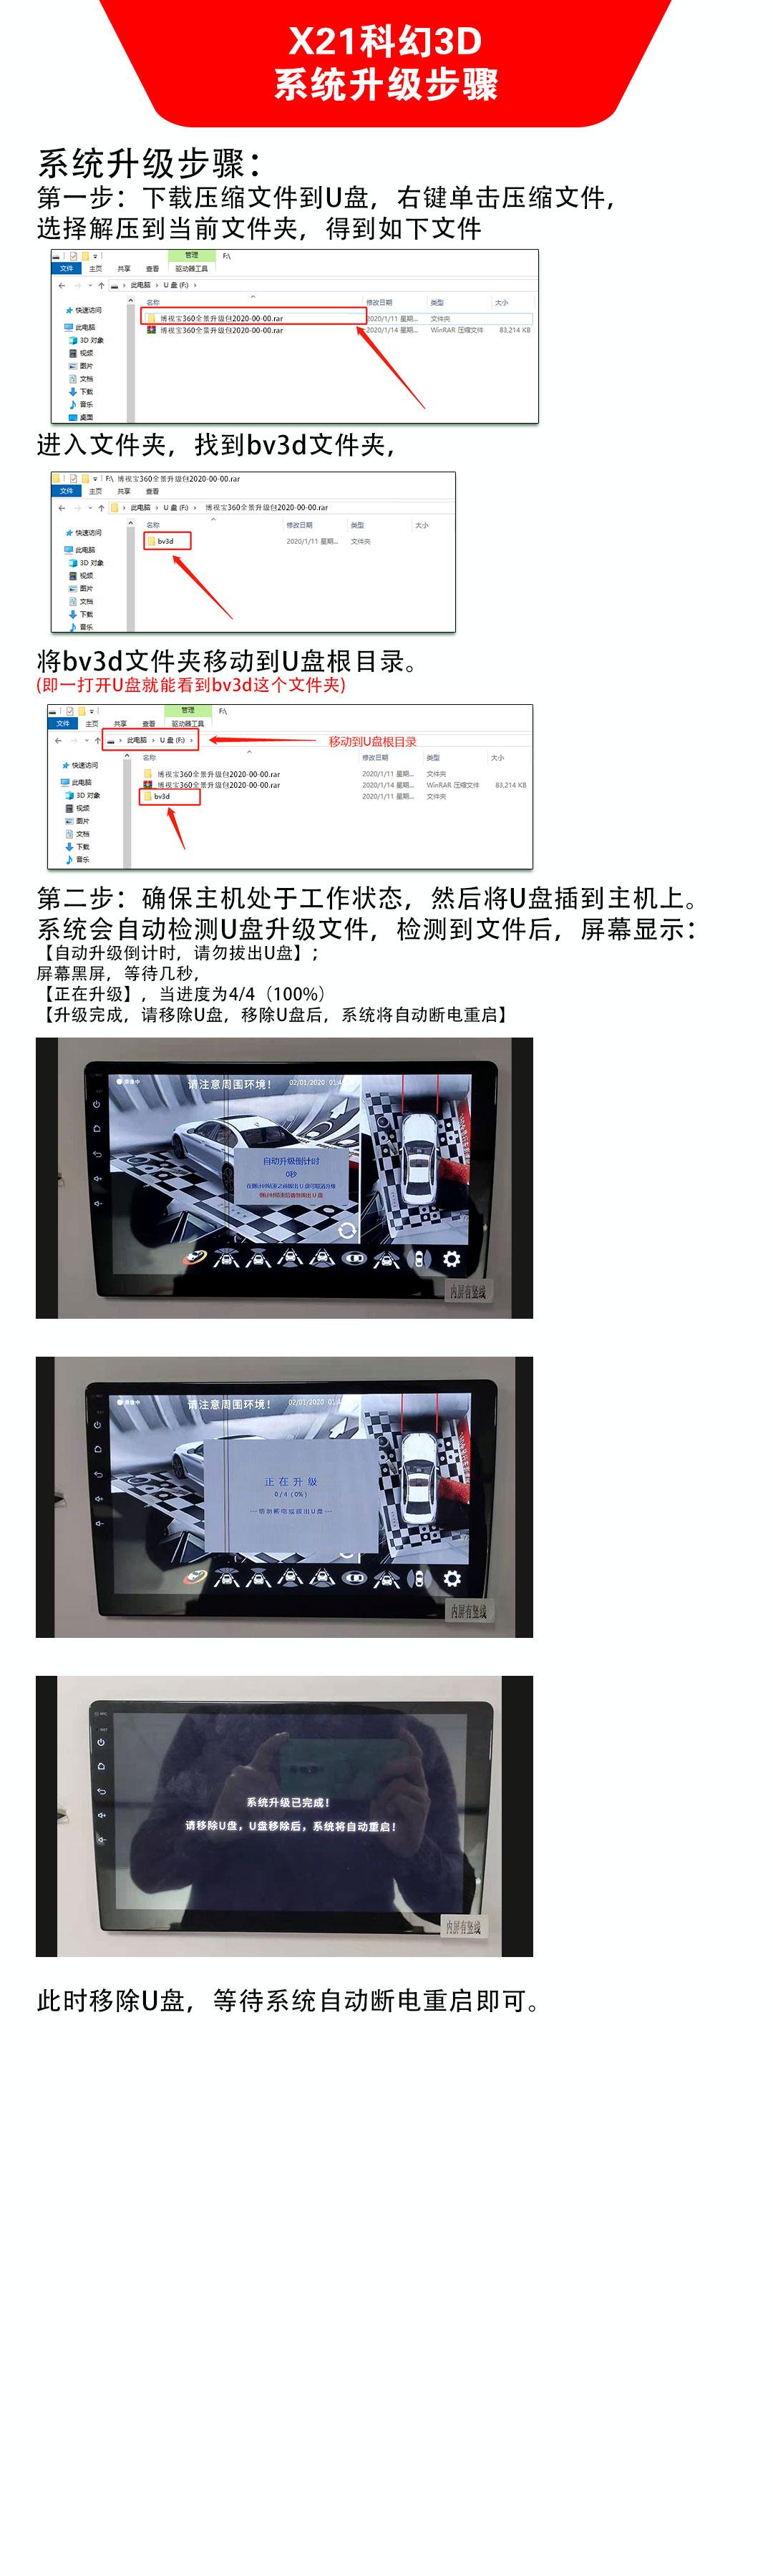 X21升級說明.jpg